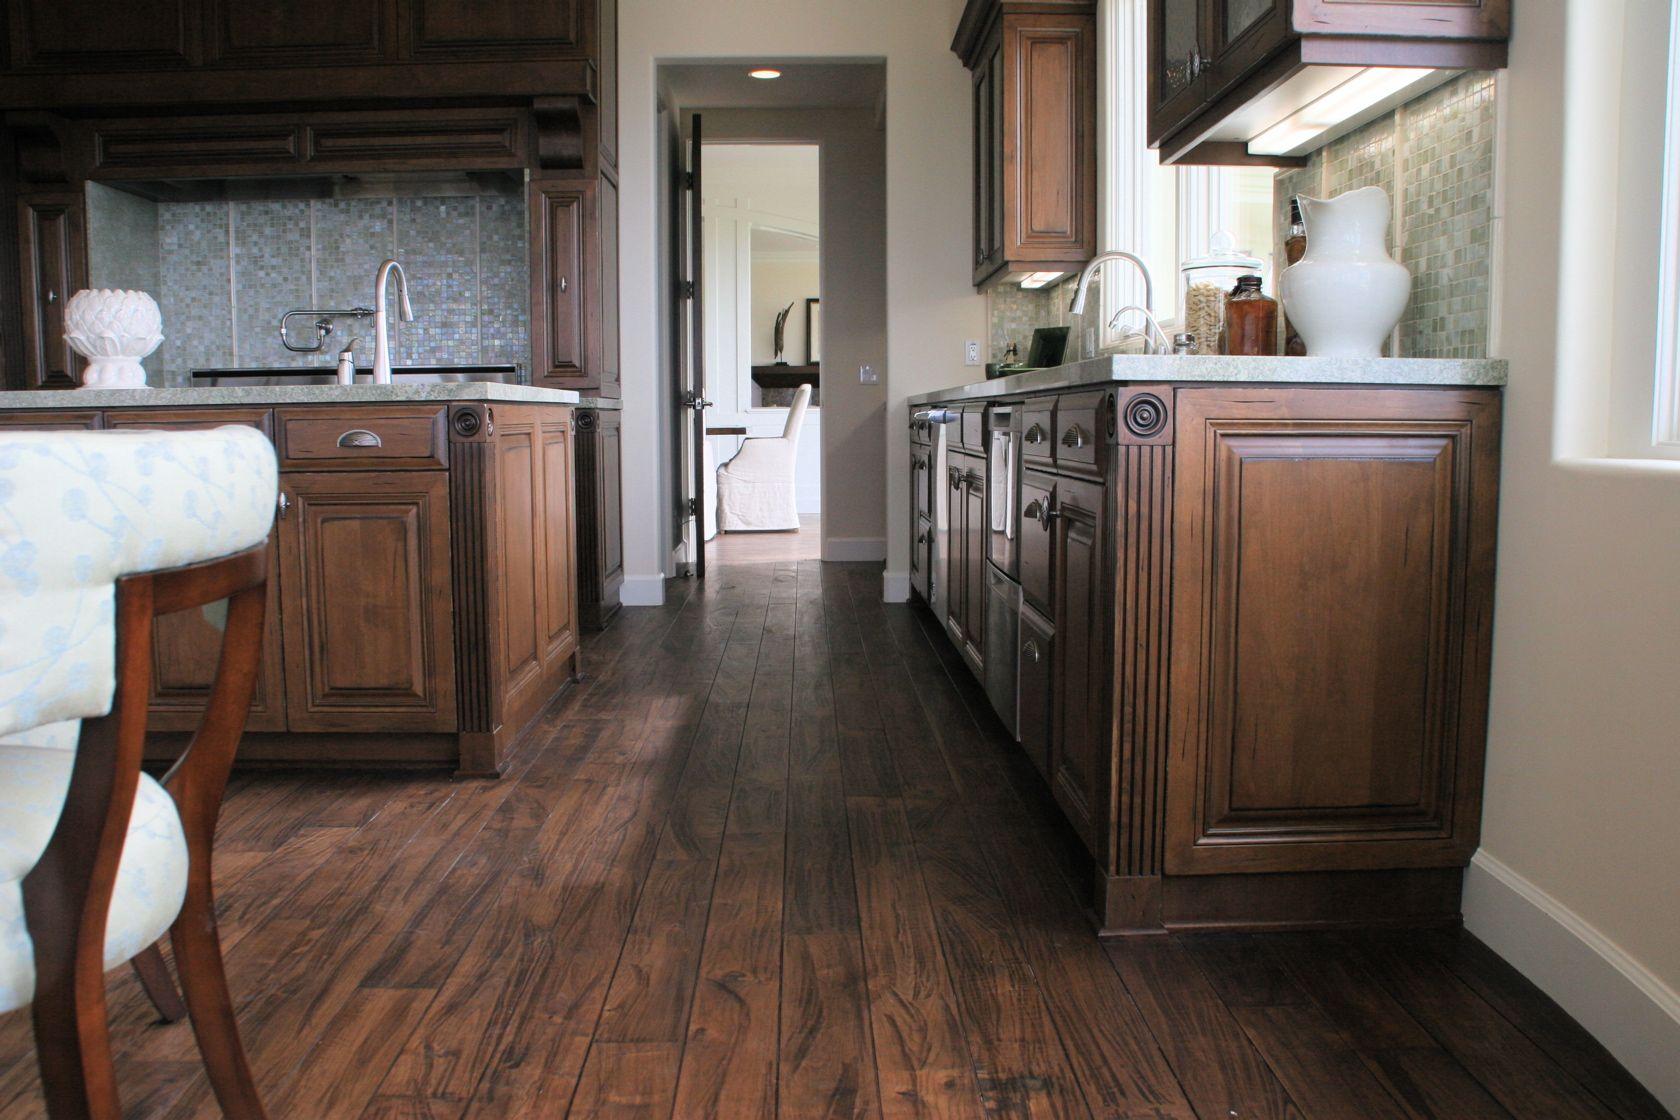 Distressed Alder Kitchen With Solid Walnut Floors, Black Glazed Cabinets,